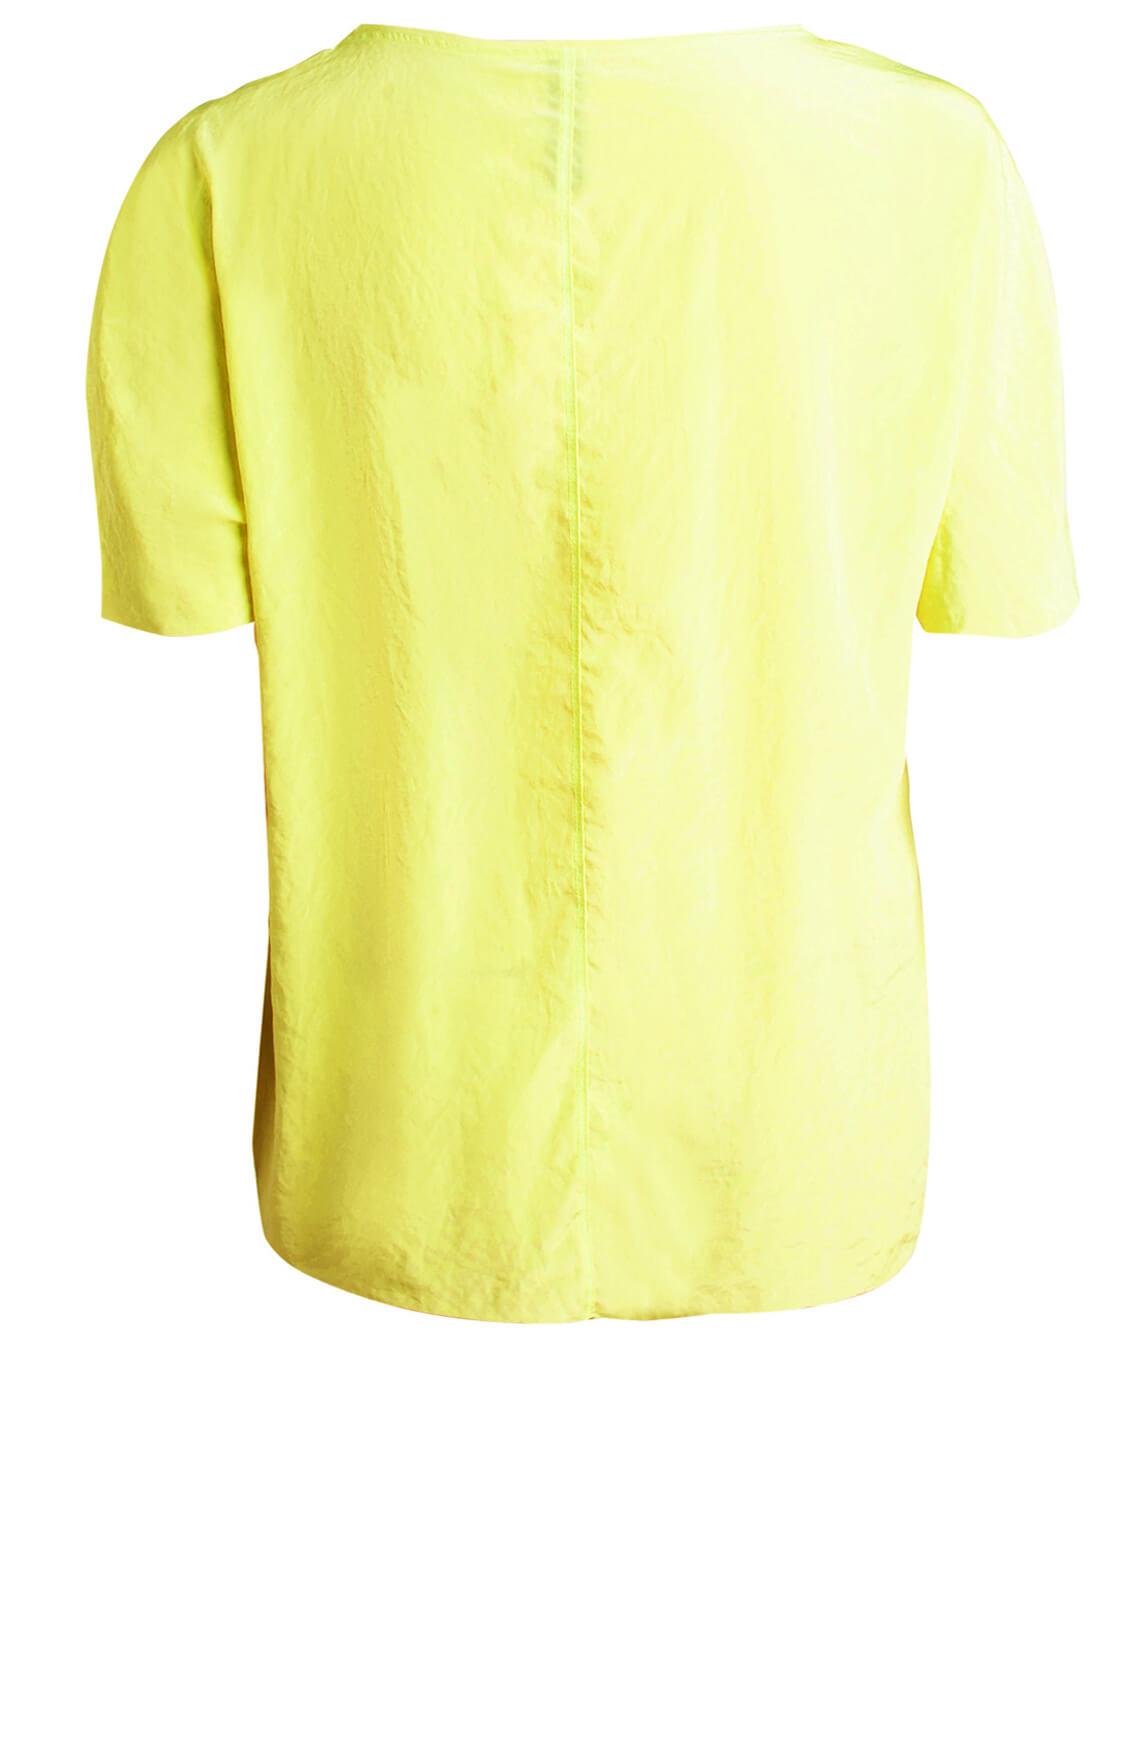 Marccain Sports Dames Blouseshirt geel